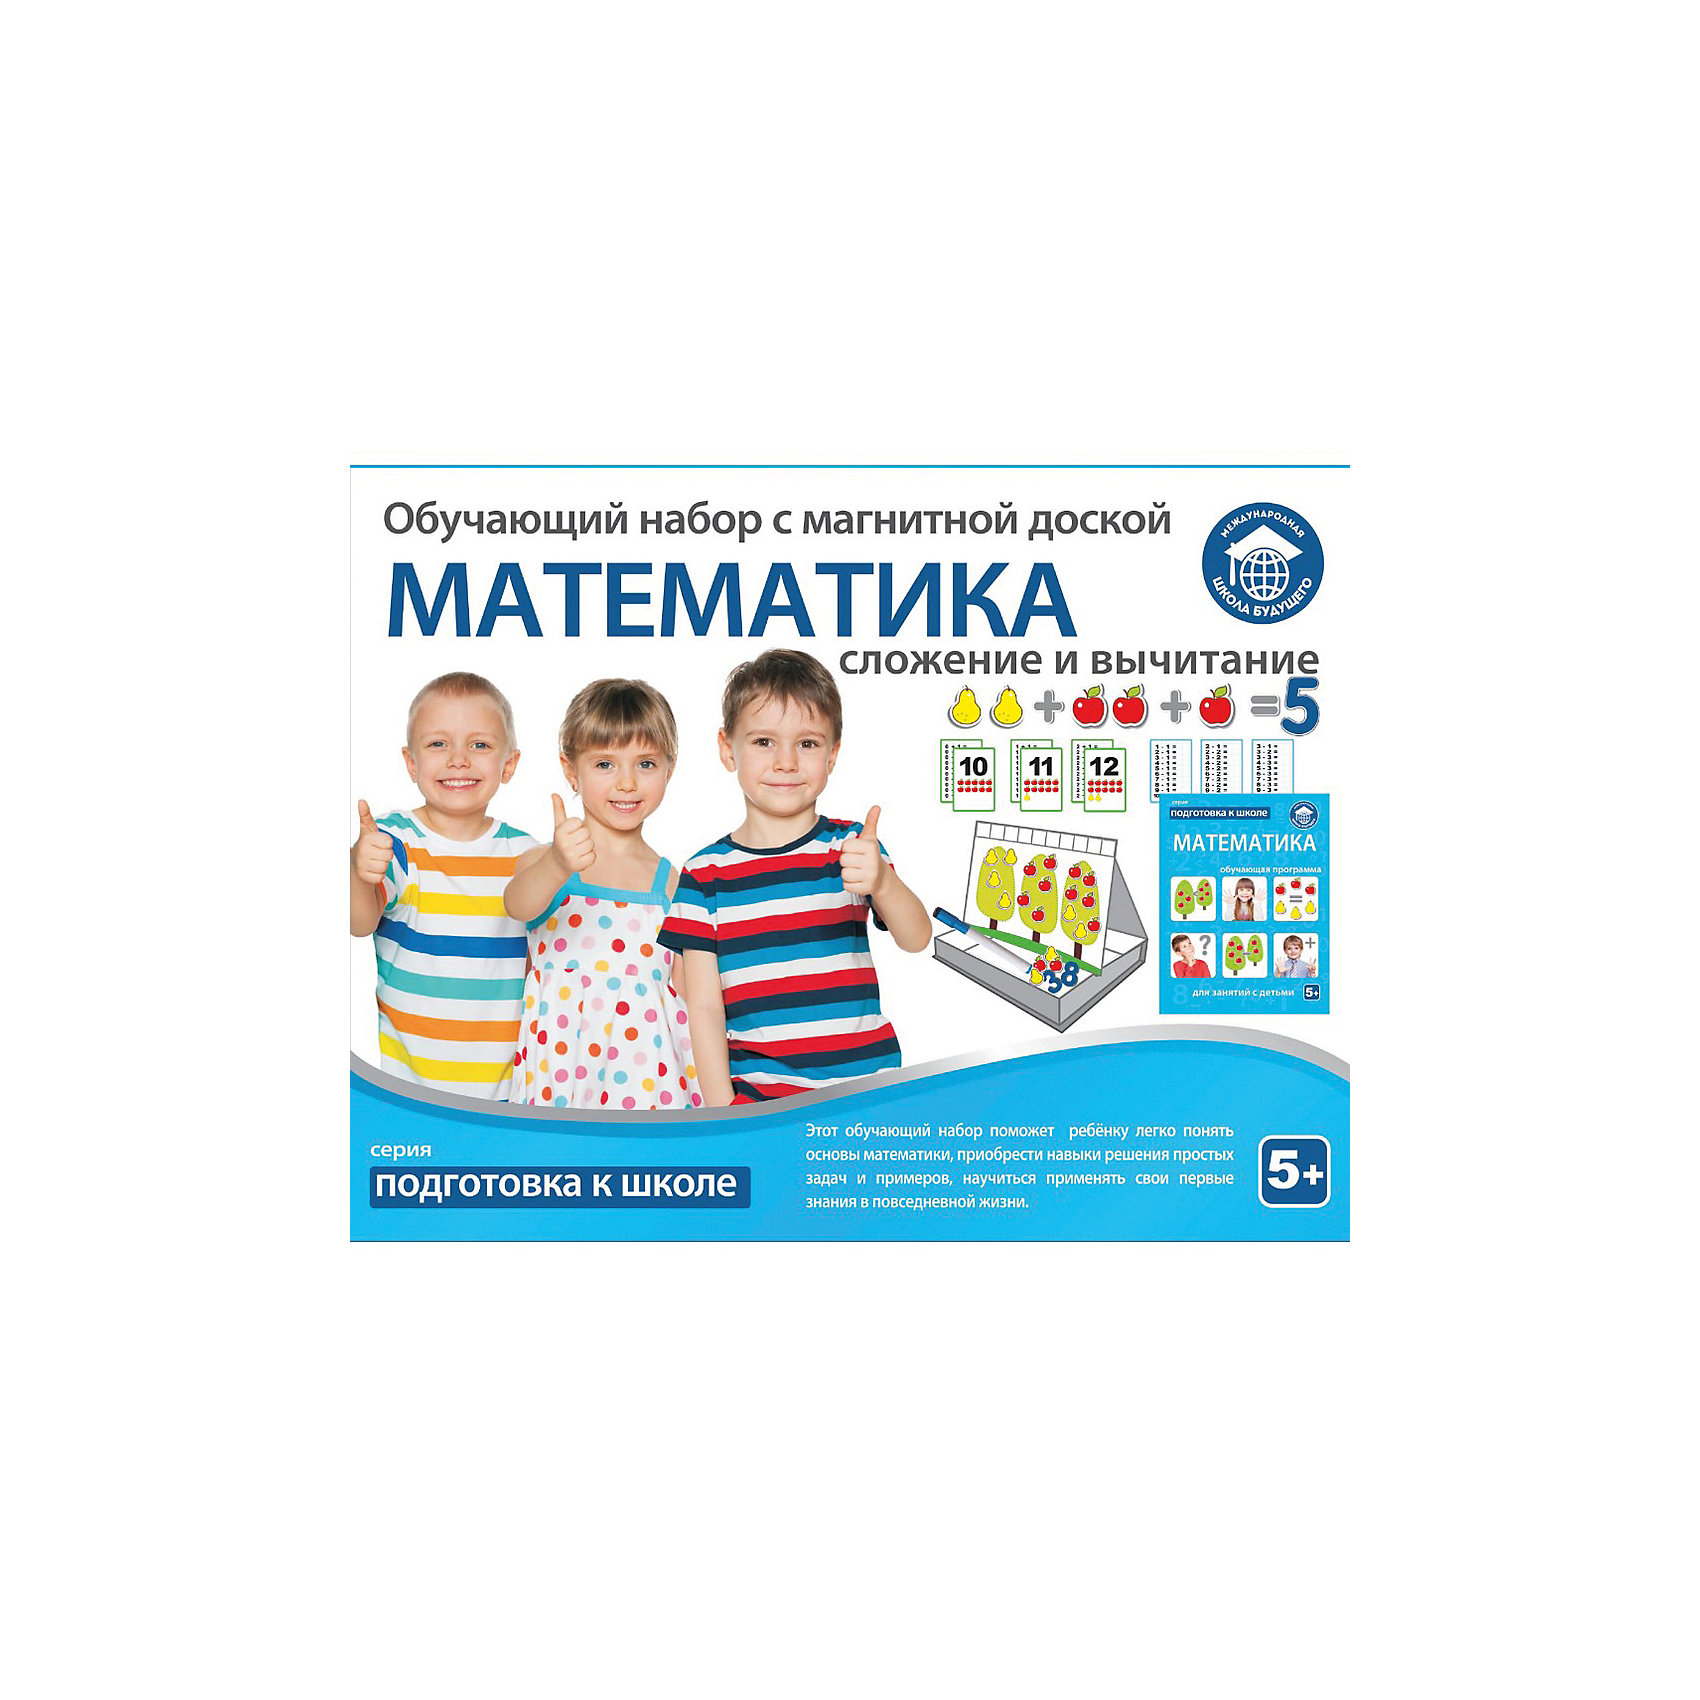 Обучающий набор «Математика: сложение и вычитание» от myToys